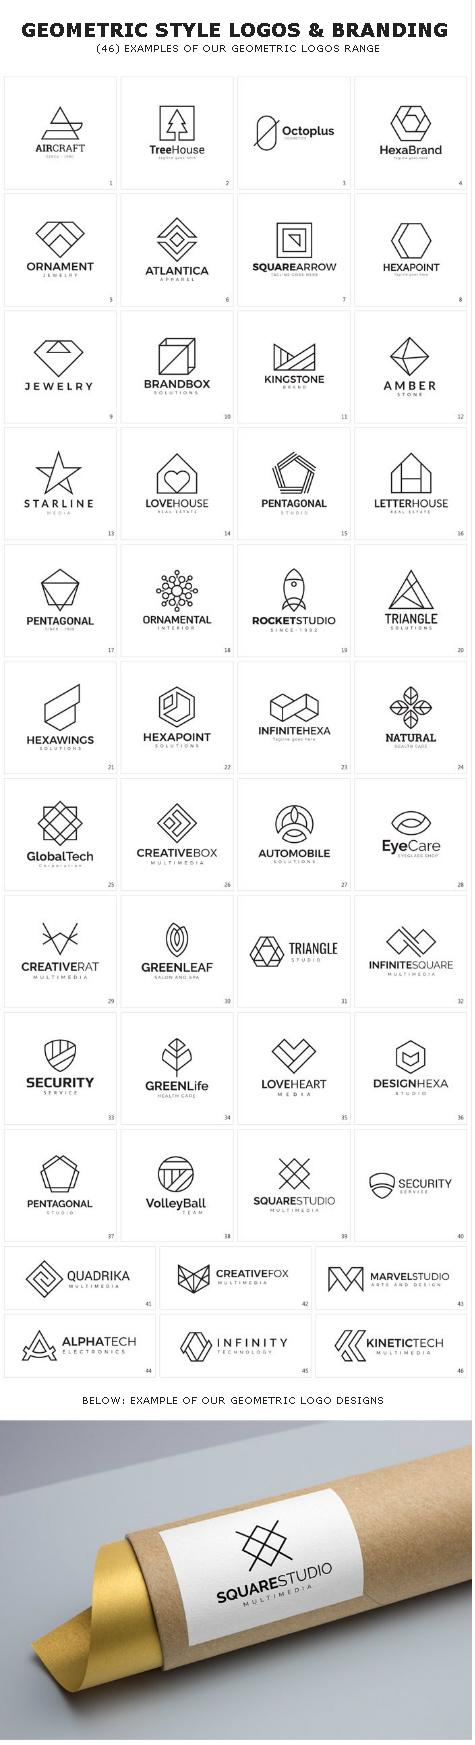 geometric style logo designs & branding